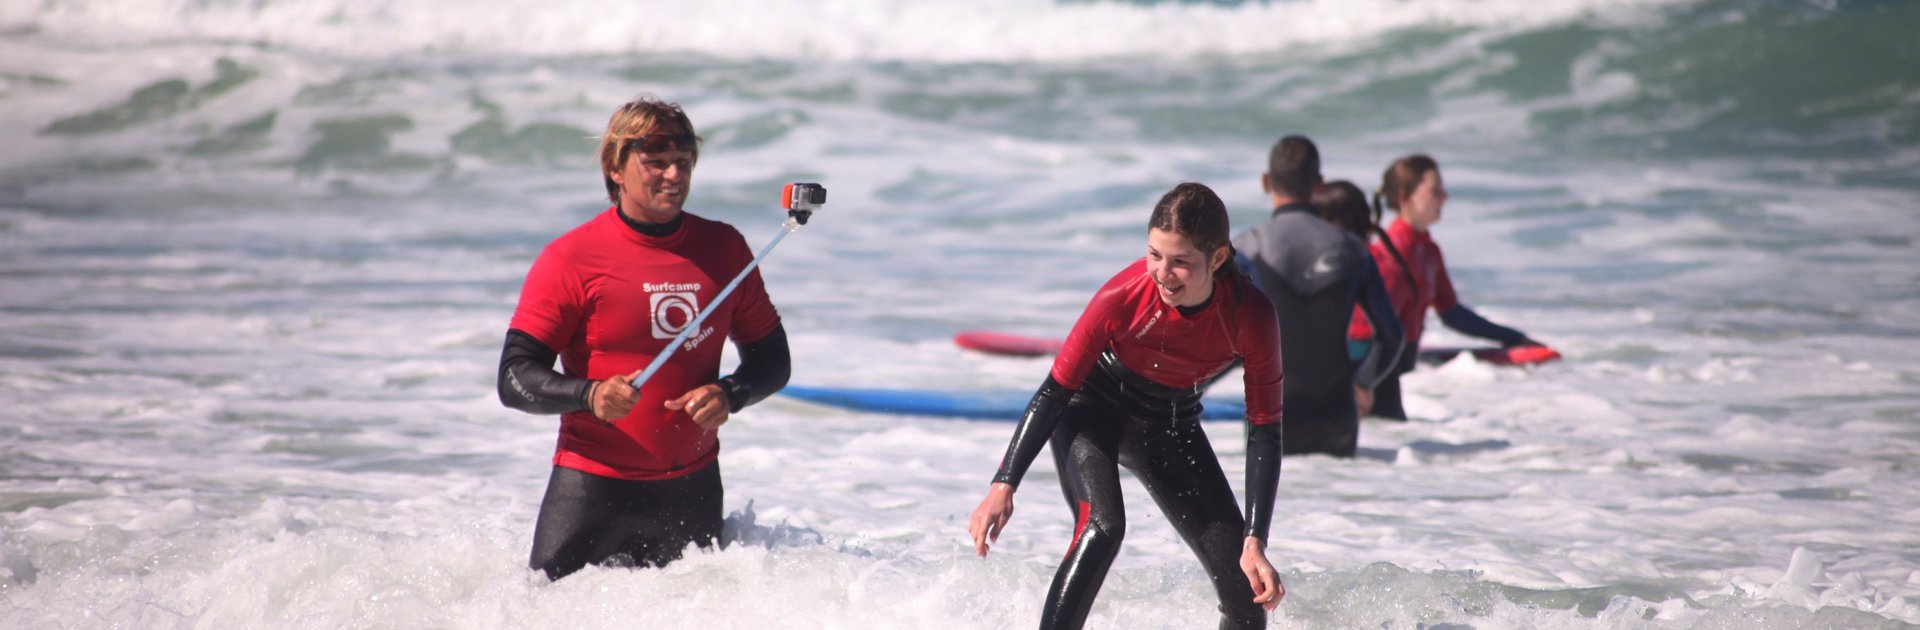 Surfing Lessons, Cadiz, Conil, El Palmar